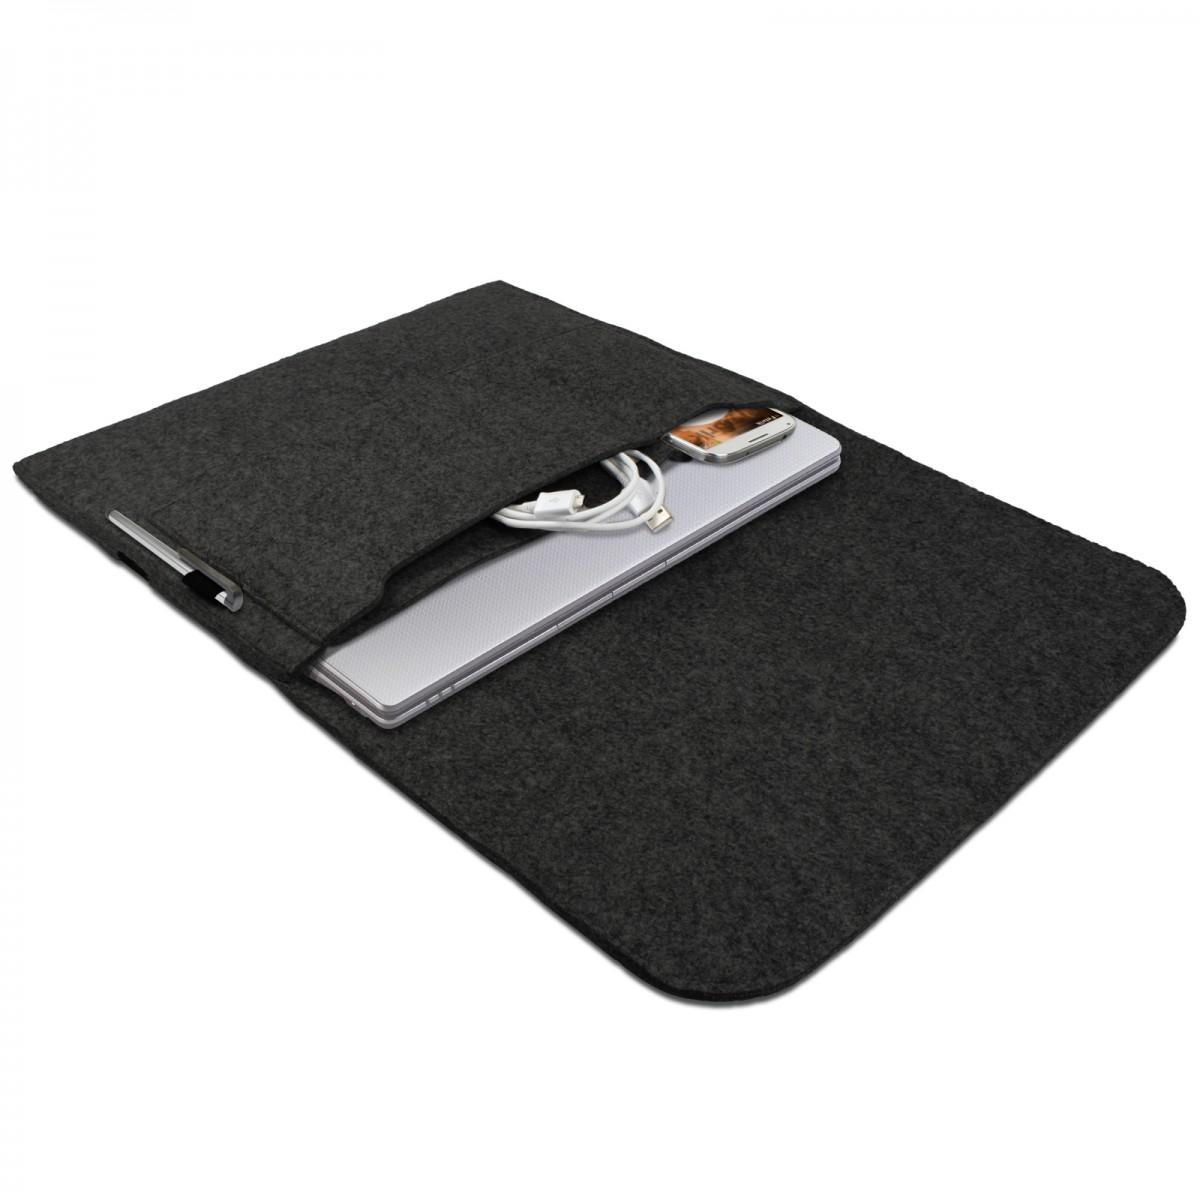 EFabrik Universal Sleeve Cover Fur 133 Zoll Laptop